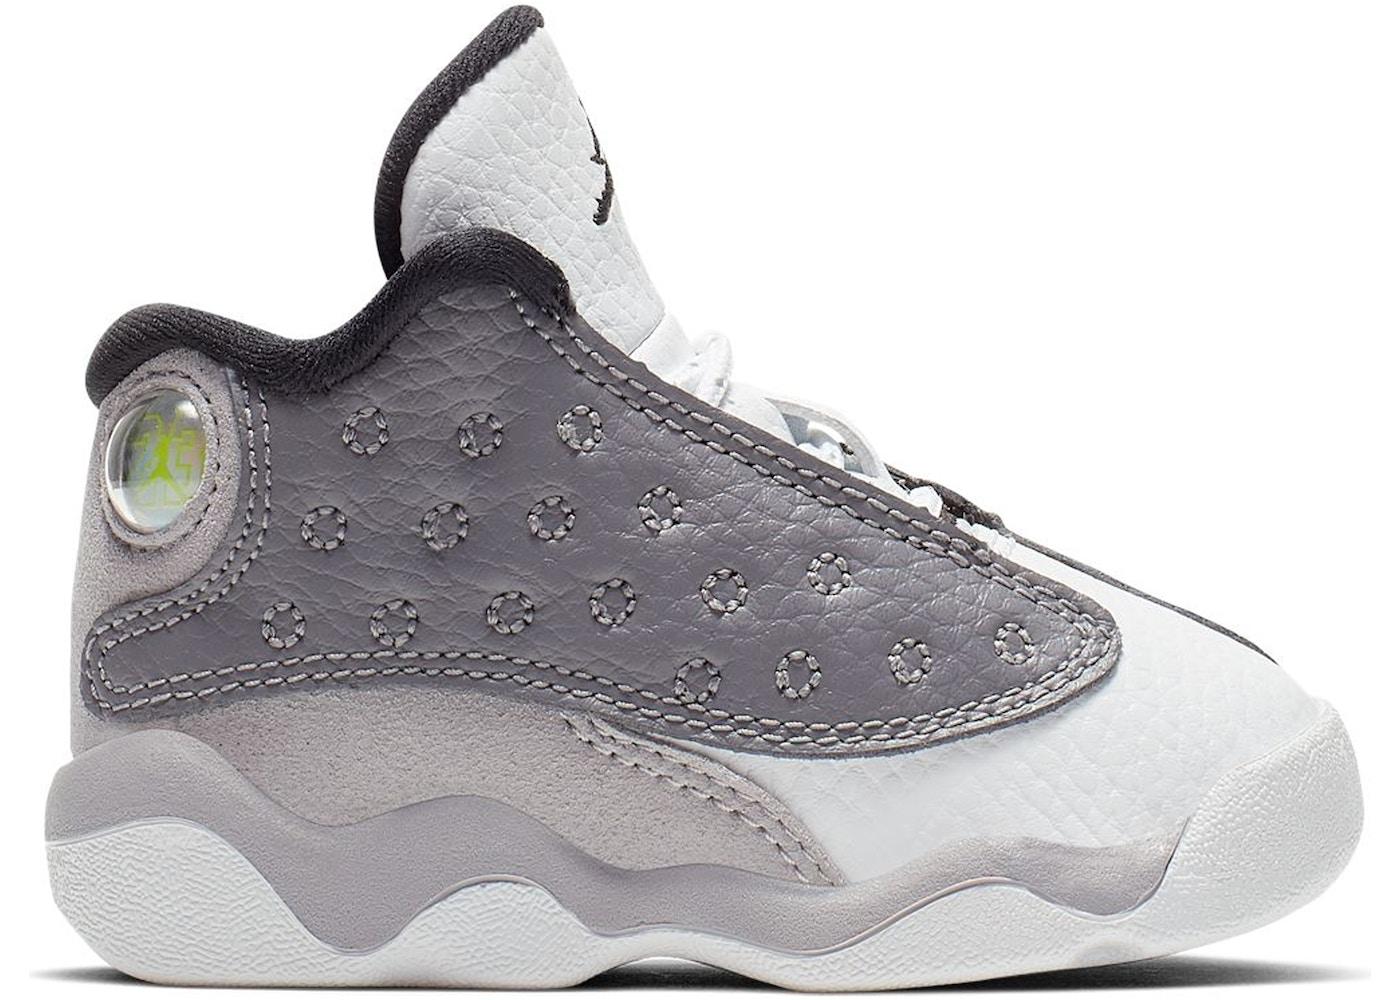 e025798b2852e0 Air Jordan Size 4 Shoes - Release Date